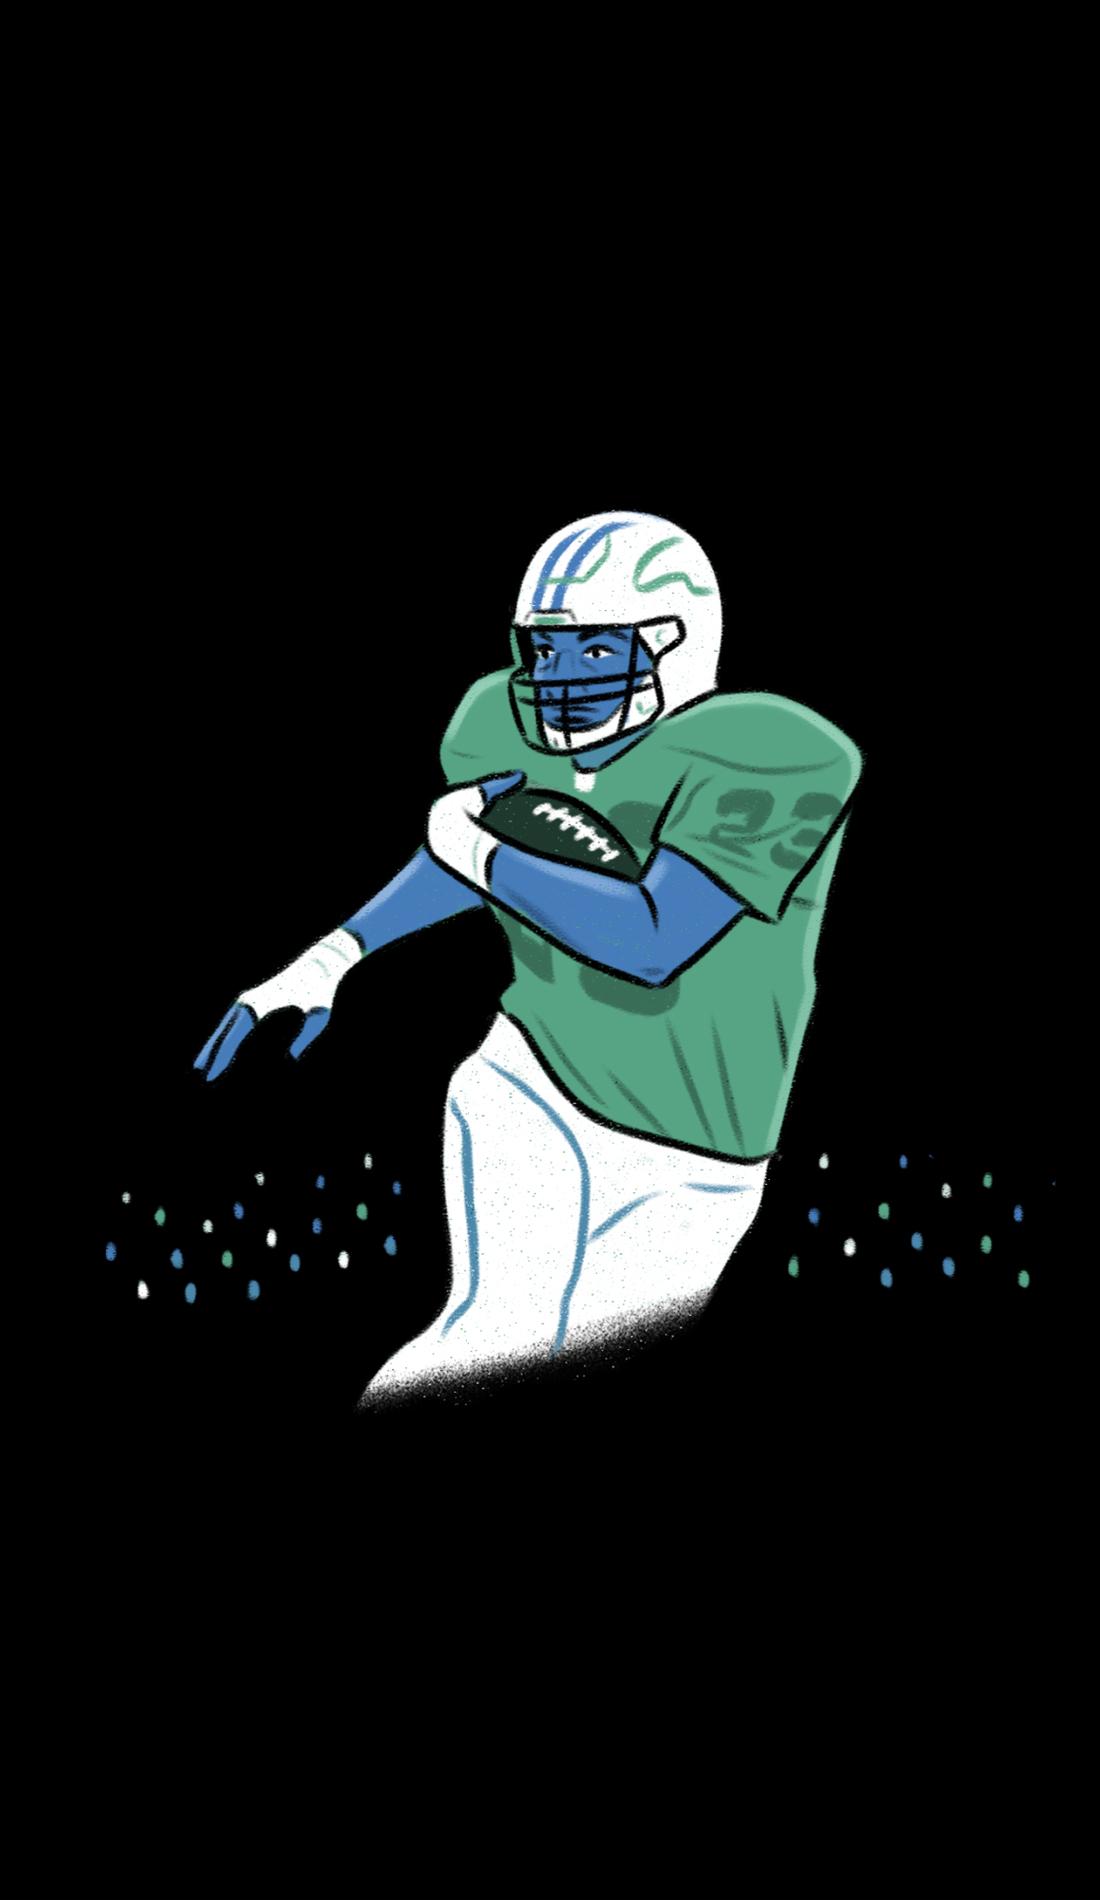 A North Carolina Central Eagles Football live event